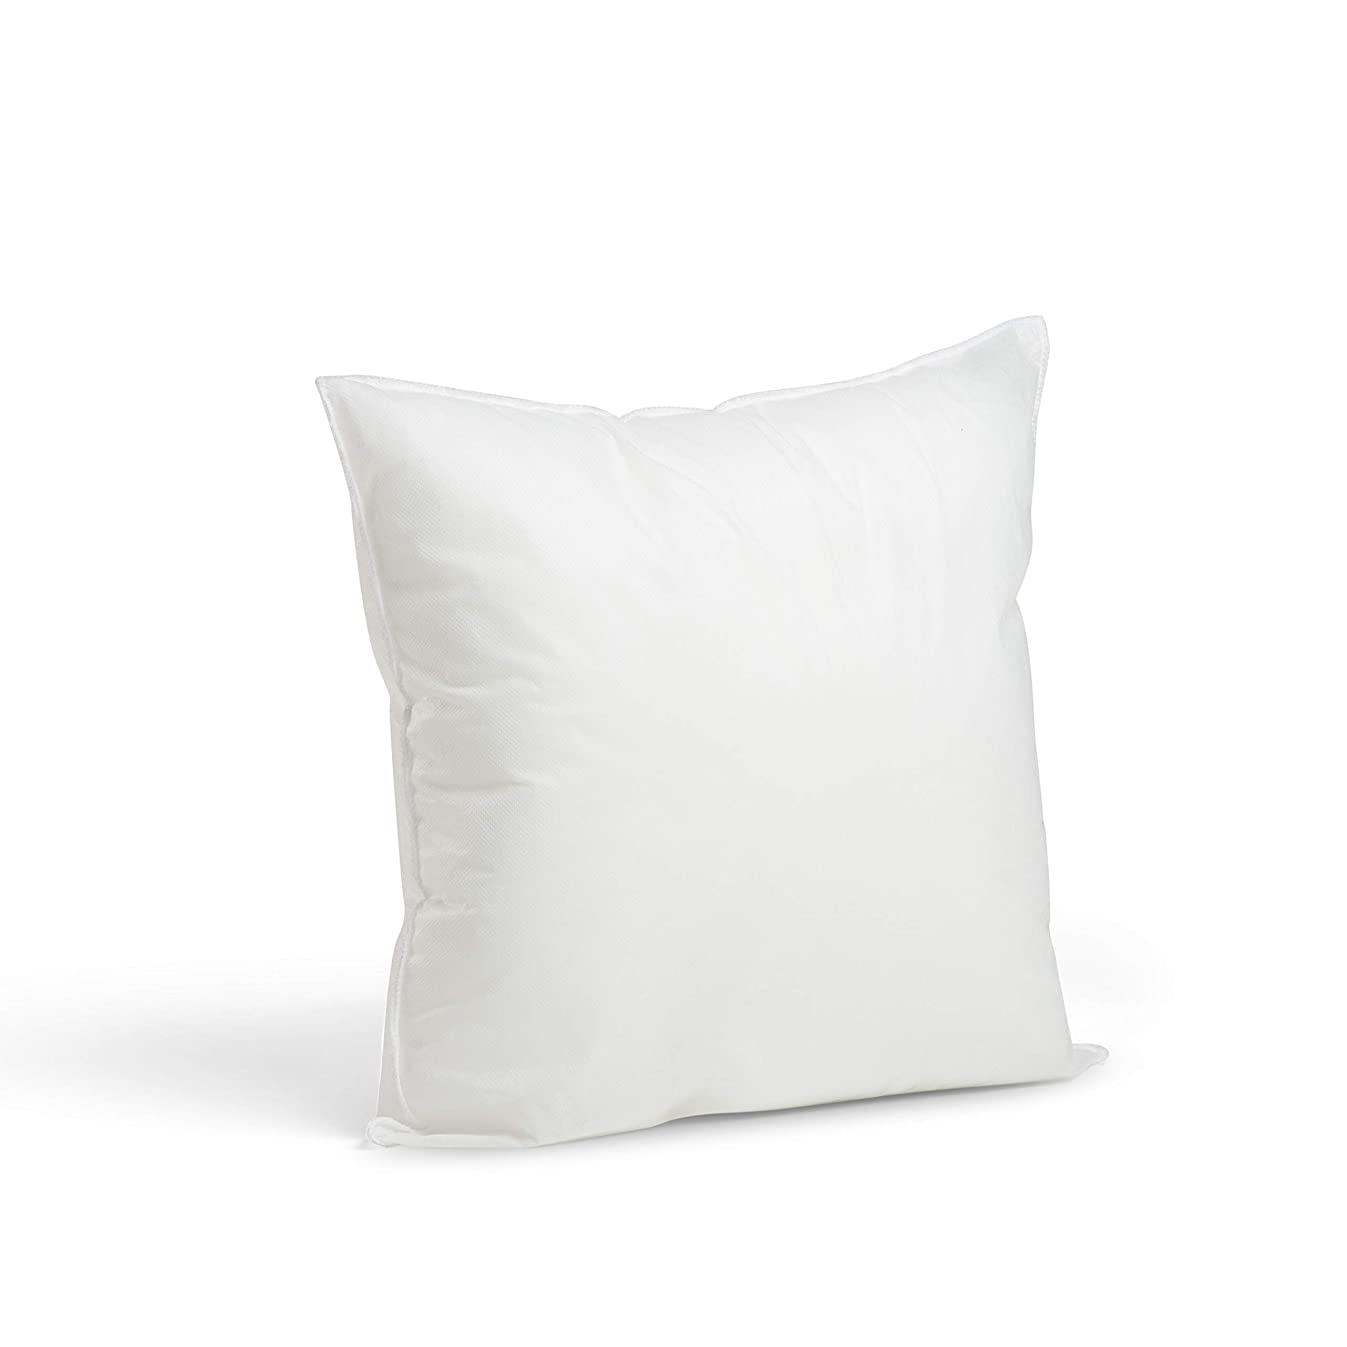 Foamily Premium Hypoallergenic Stuffer Pillow Insert Sham Square Form Polyester, 16